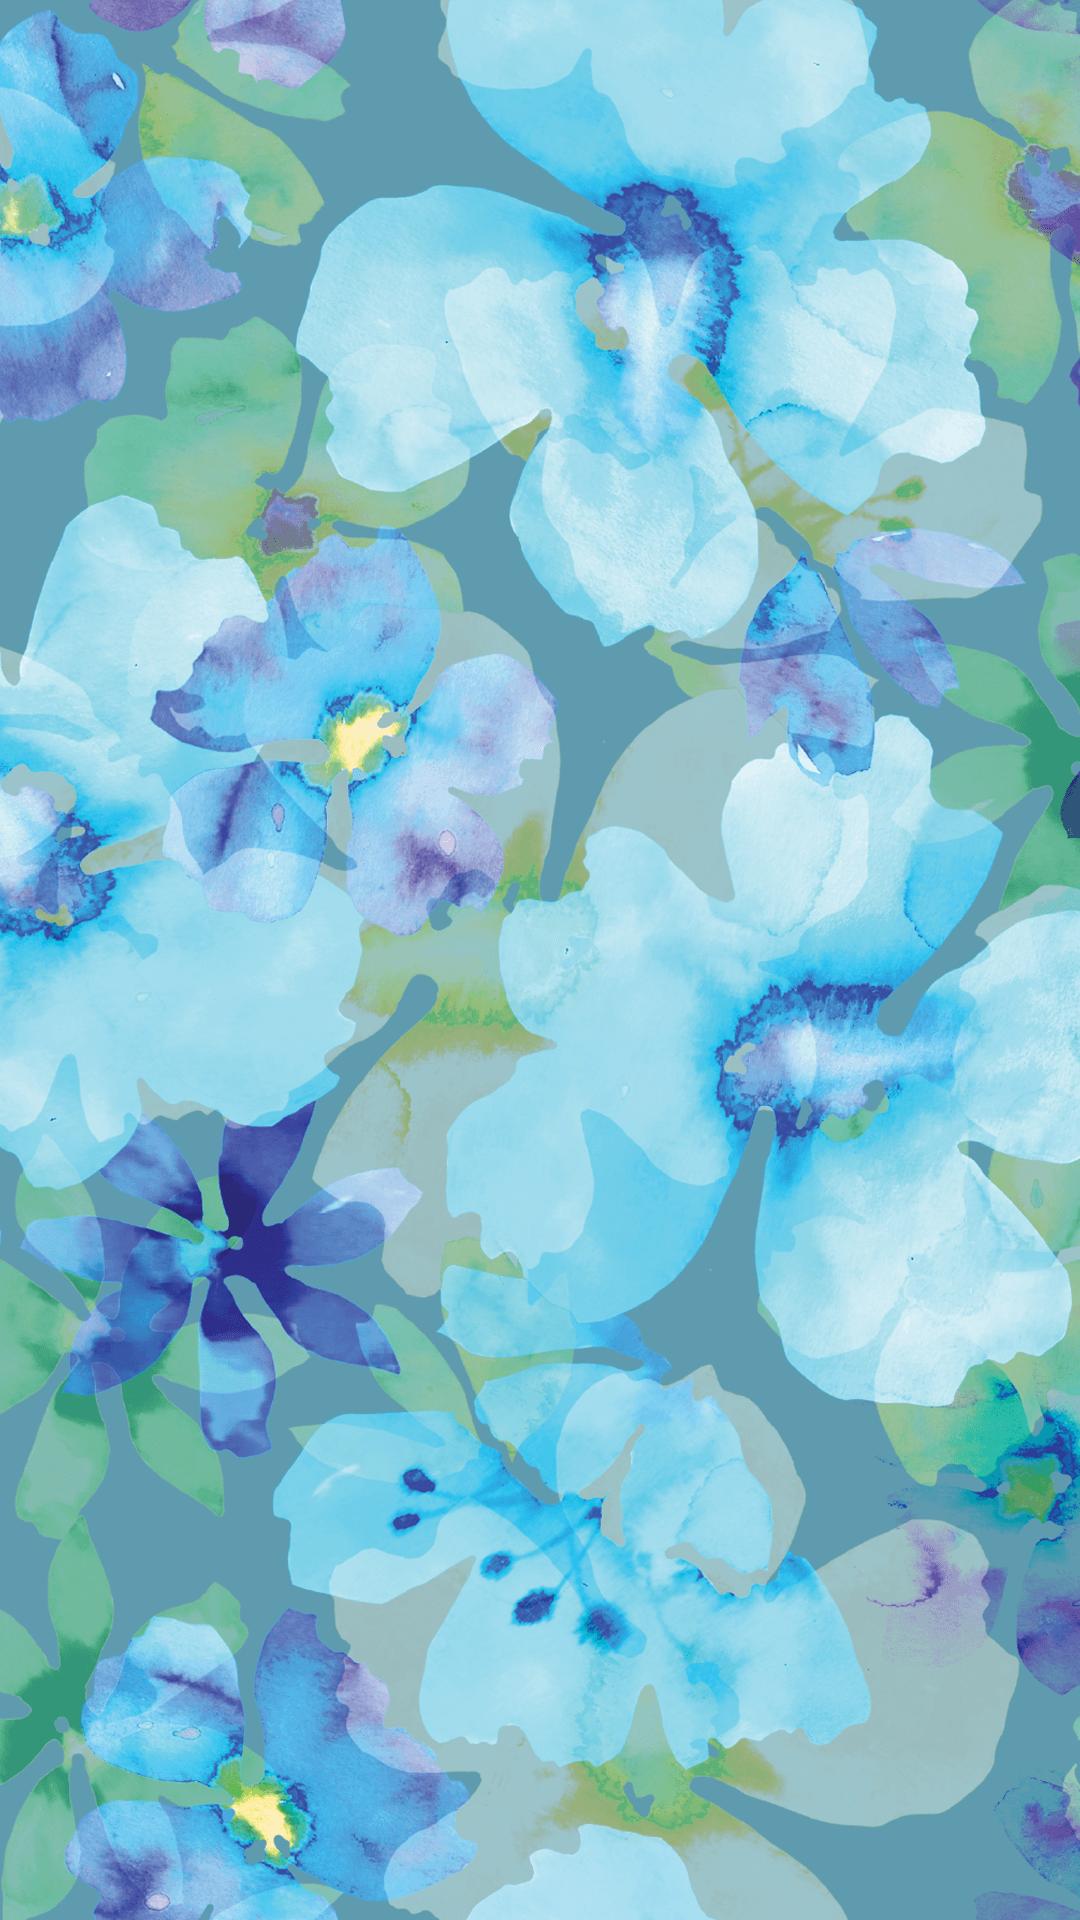 Floral Wallpaper Iphone 紫色の壁紙 花 壁紙 花 絵